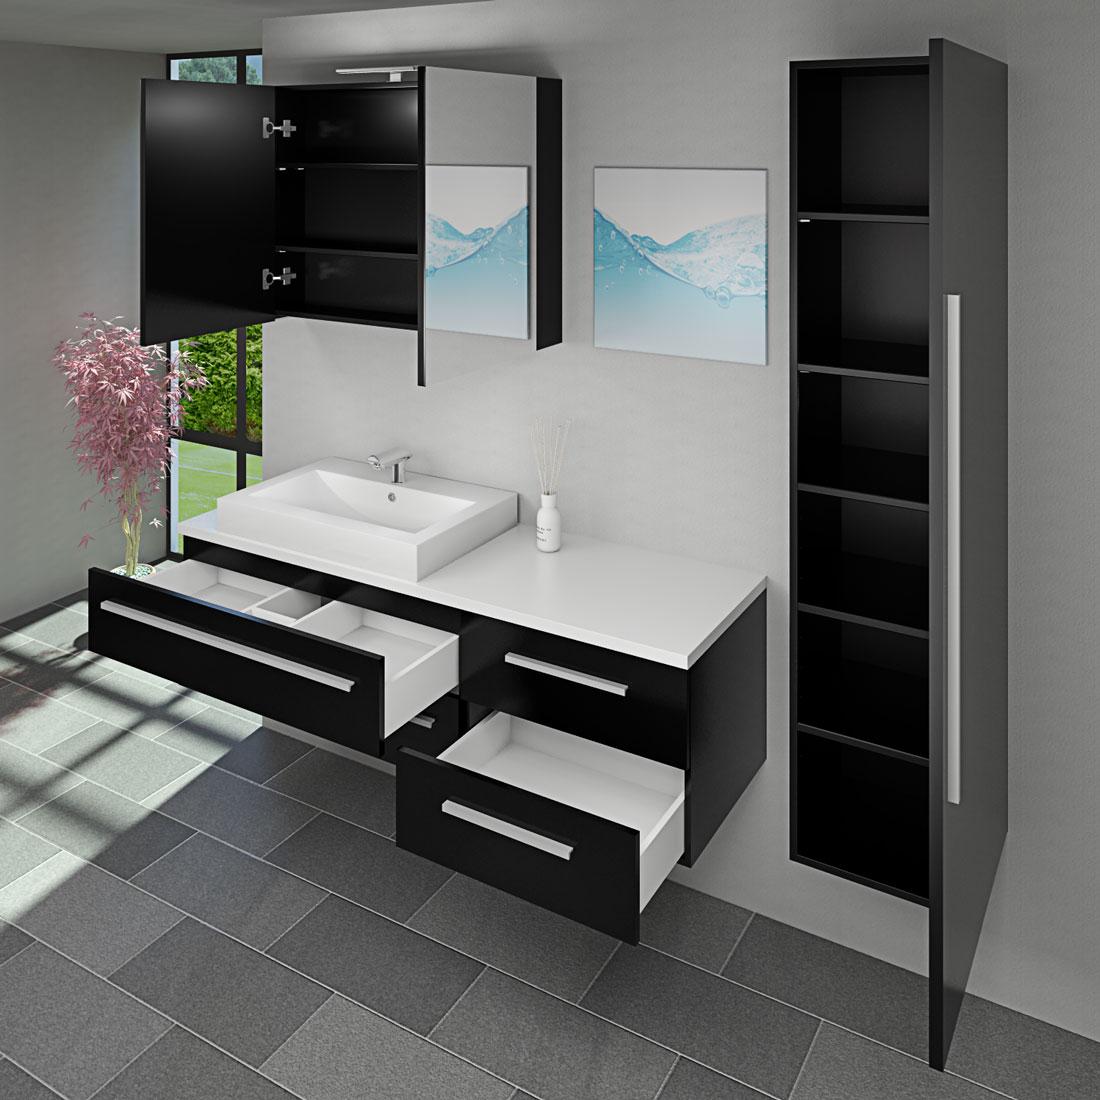 badm bel set city 210 v4 esche schwarz badezimmerm bel waschtisch 160cm. Black Bedroom Furniture Sets. Home Design Ideas